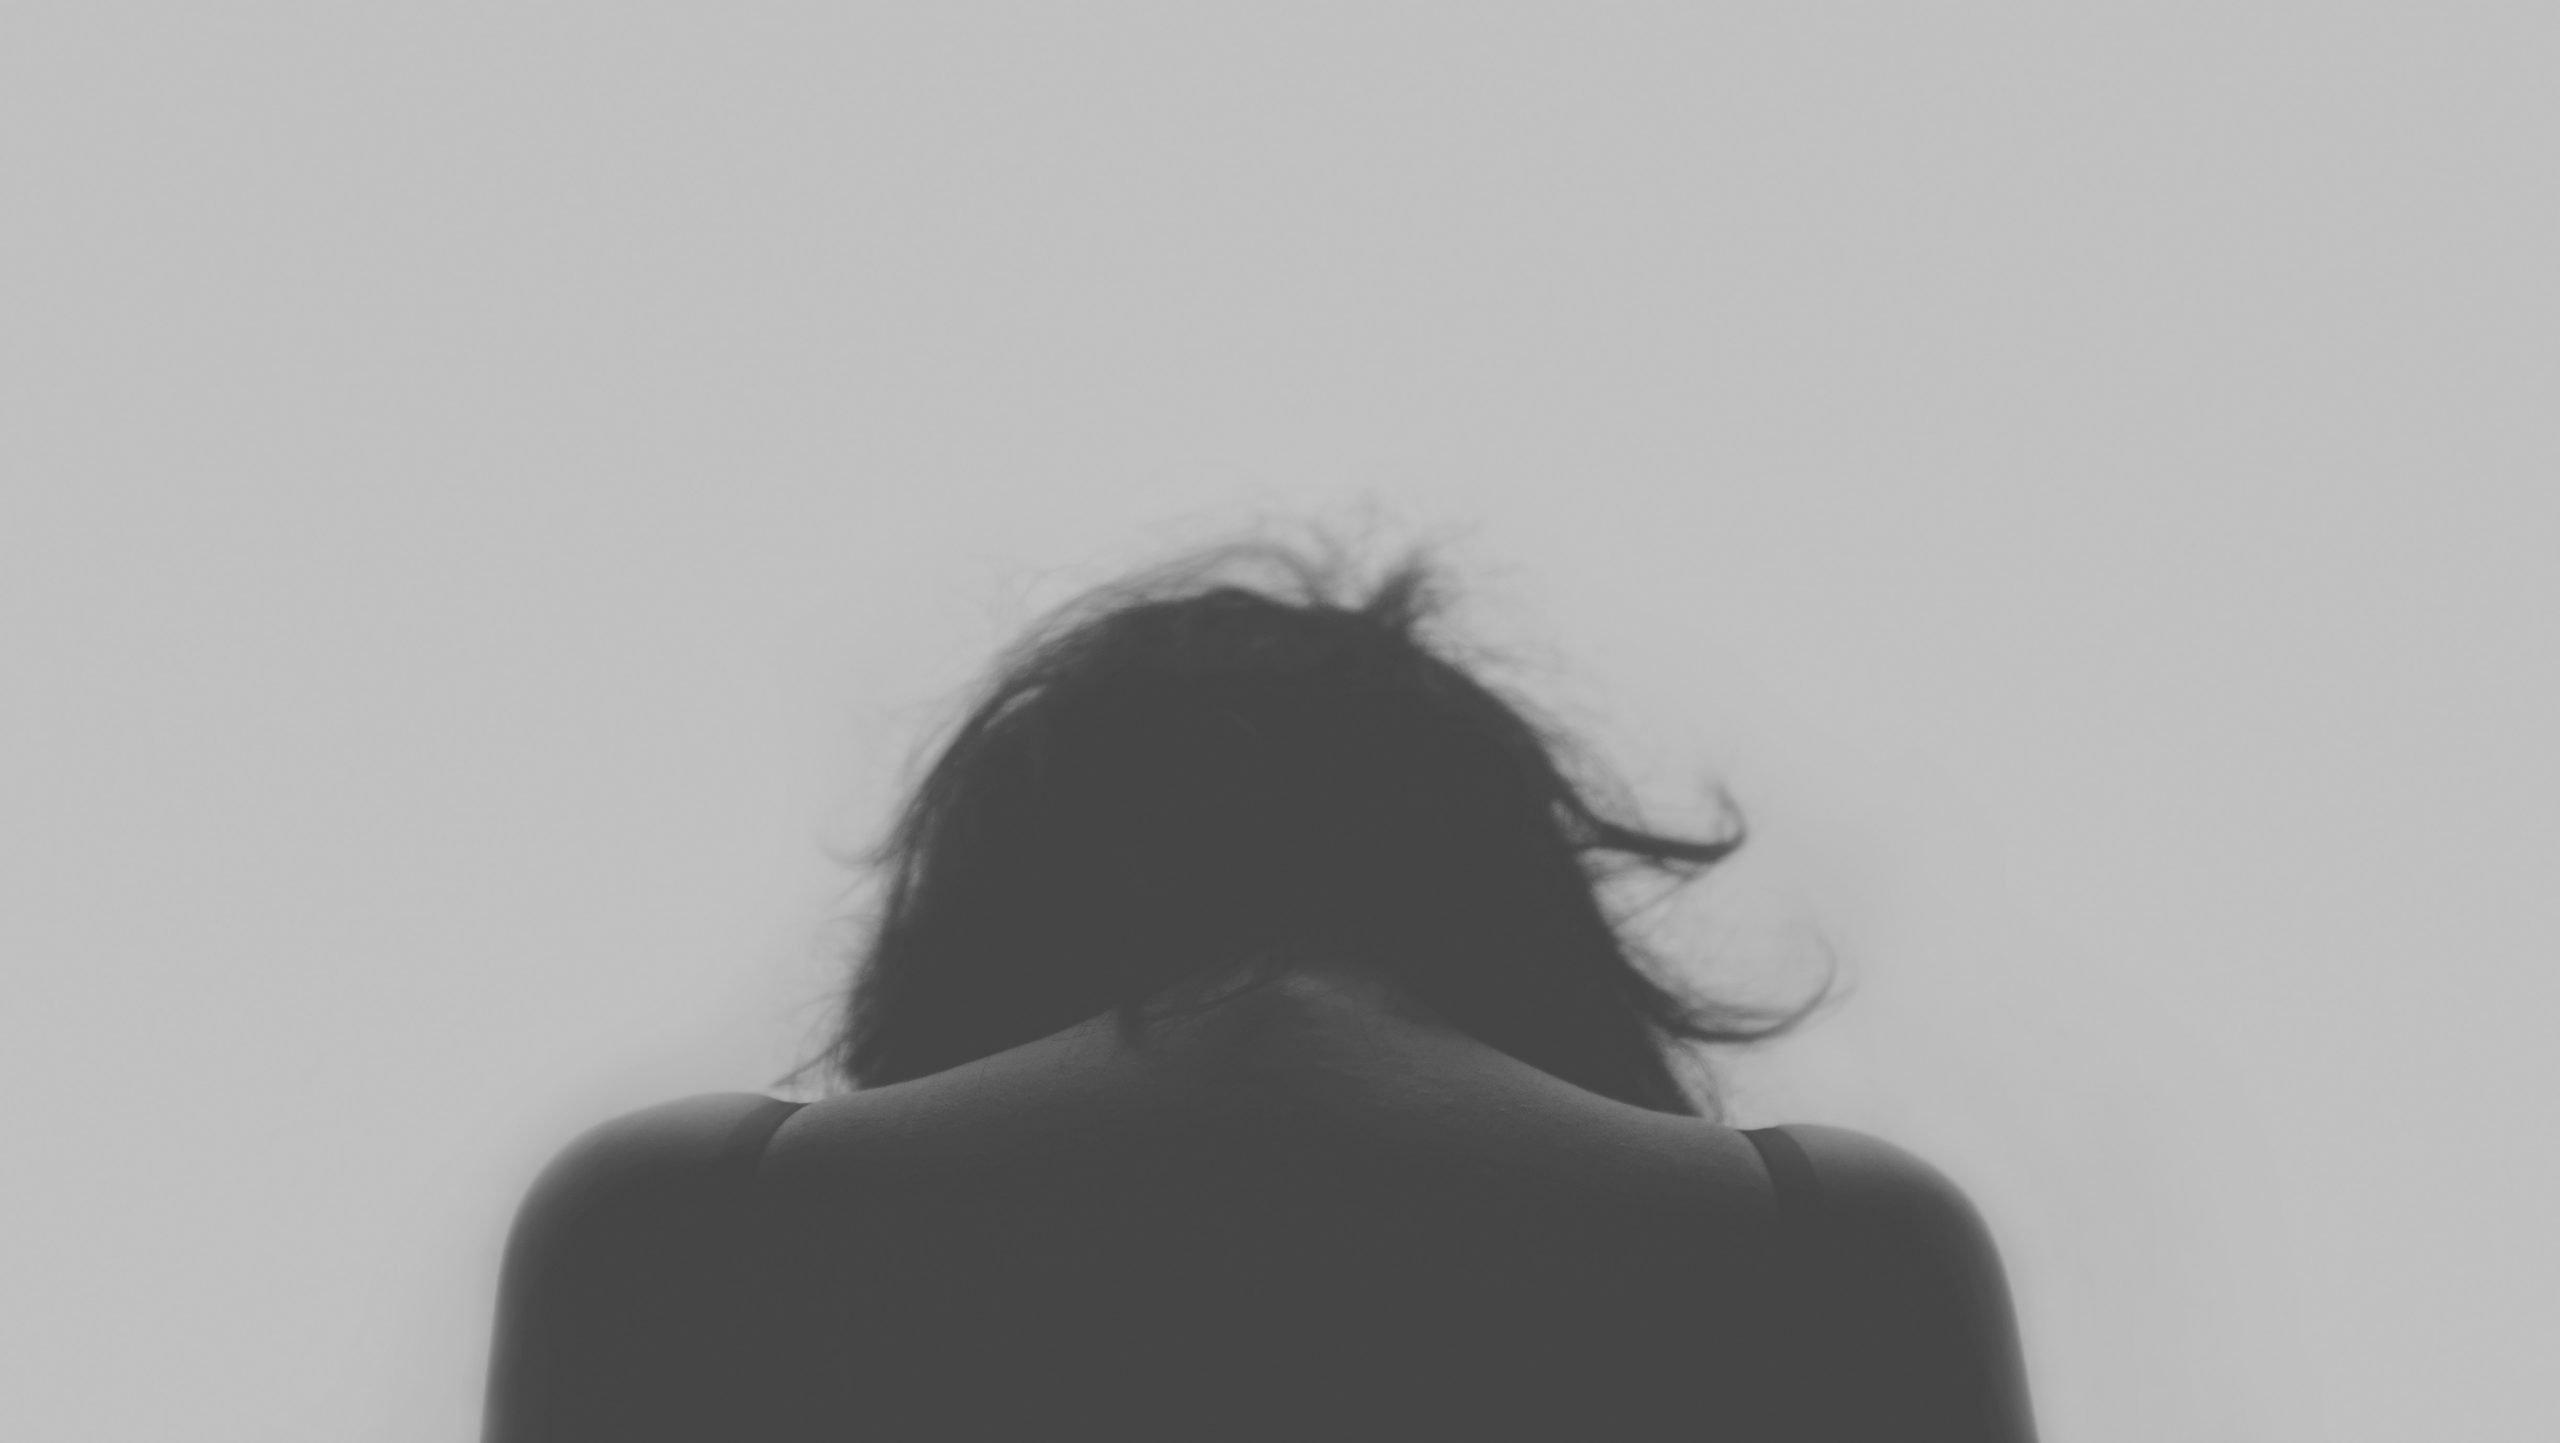 Let's Talk: Mental Health